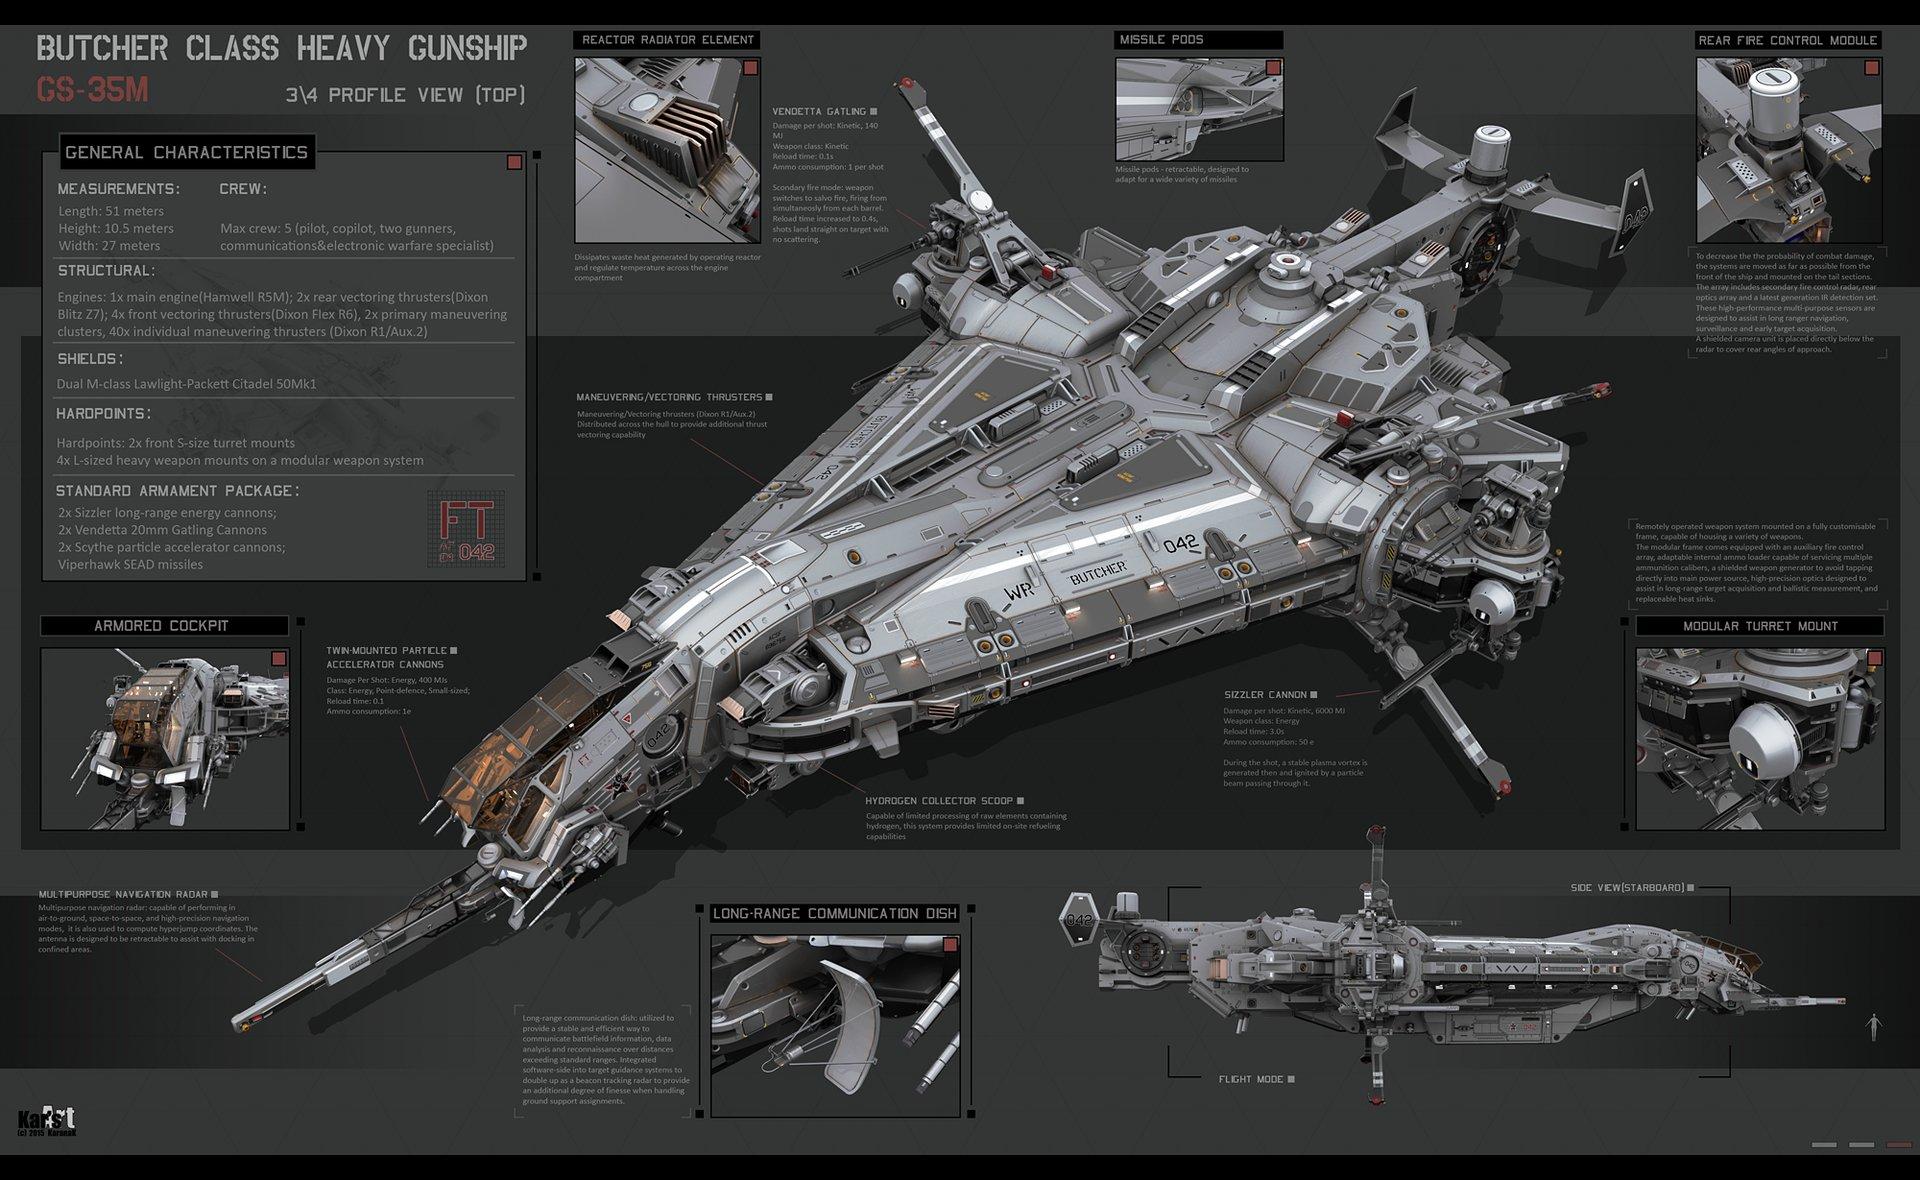 alexey-pyatov-5-butcher-class-heavy-gunship-1